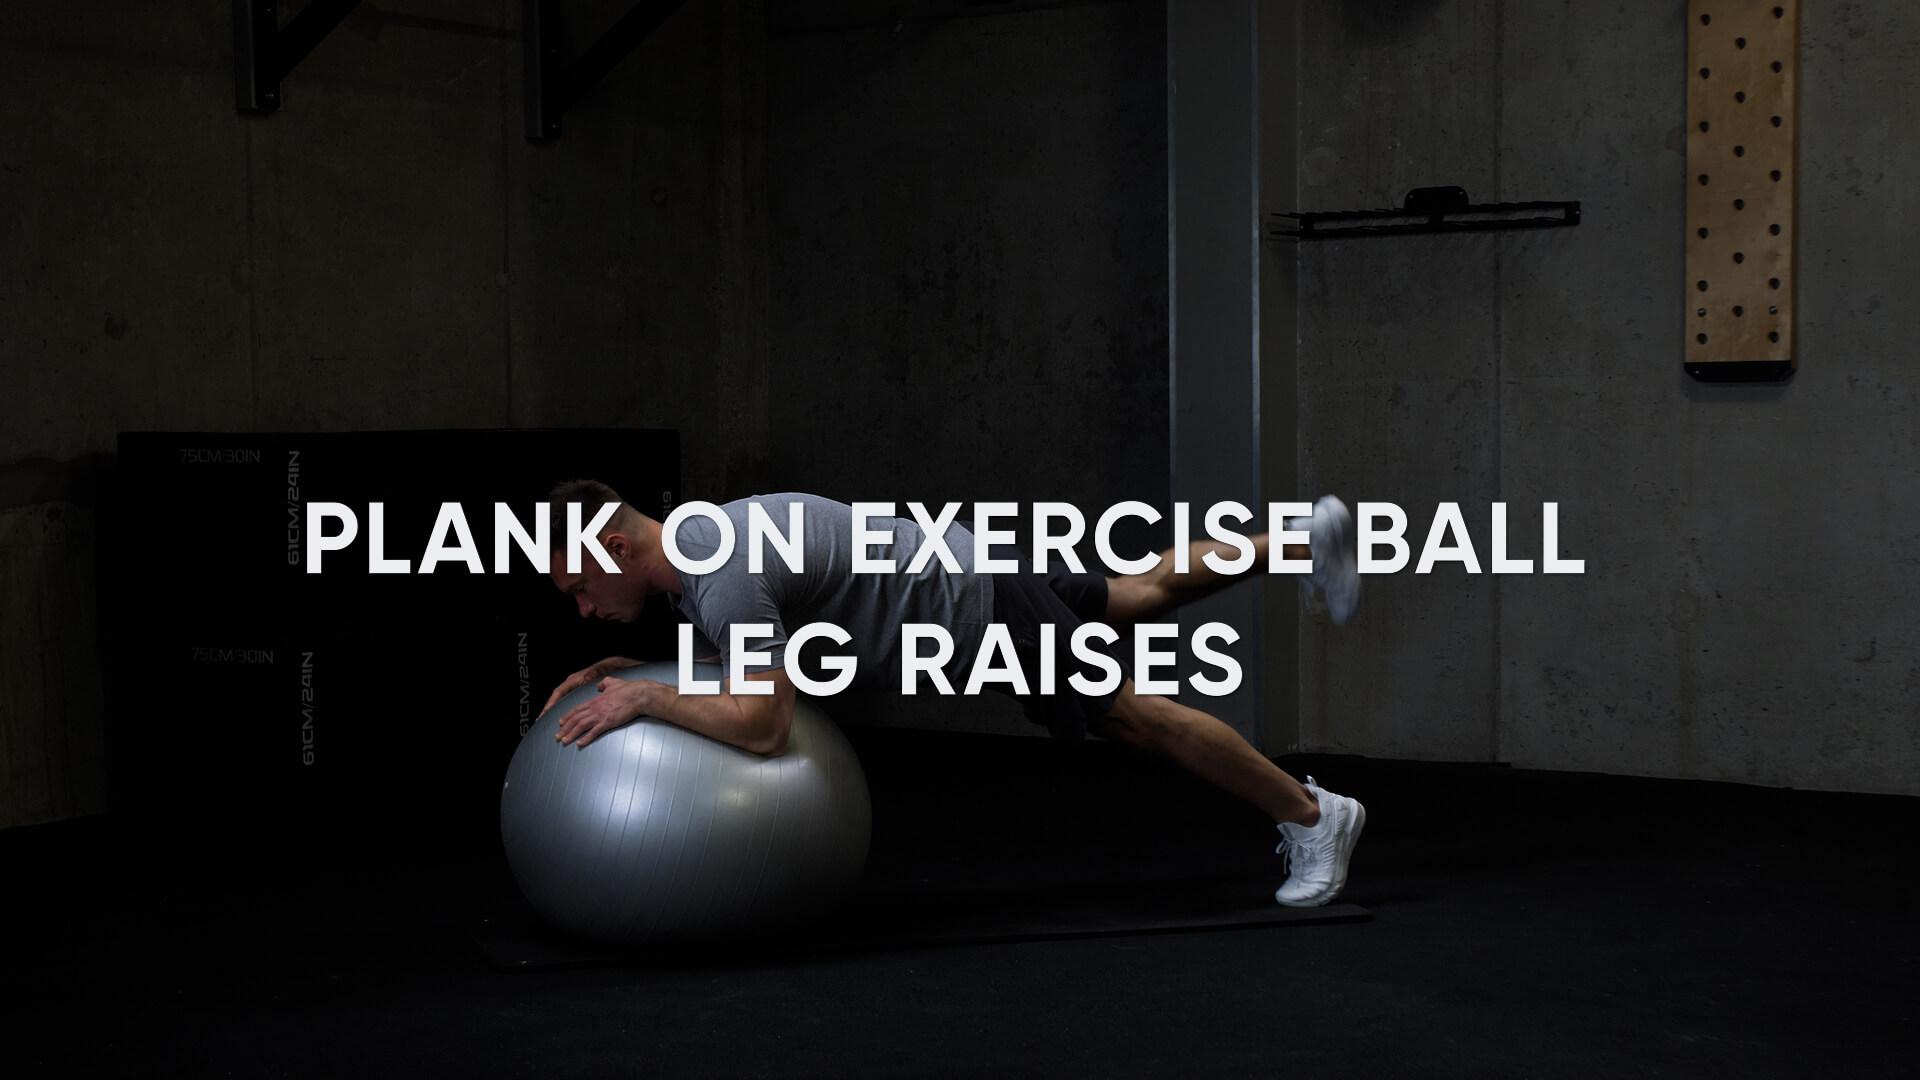 Plank on Exercise Ball Leg Raises